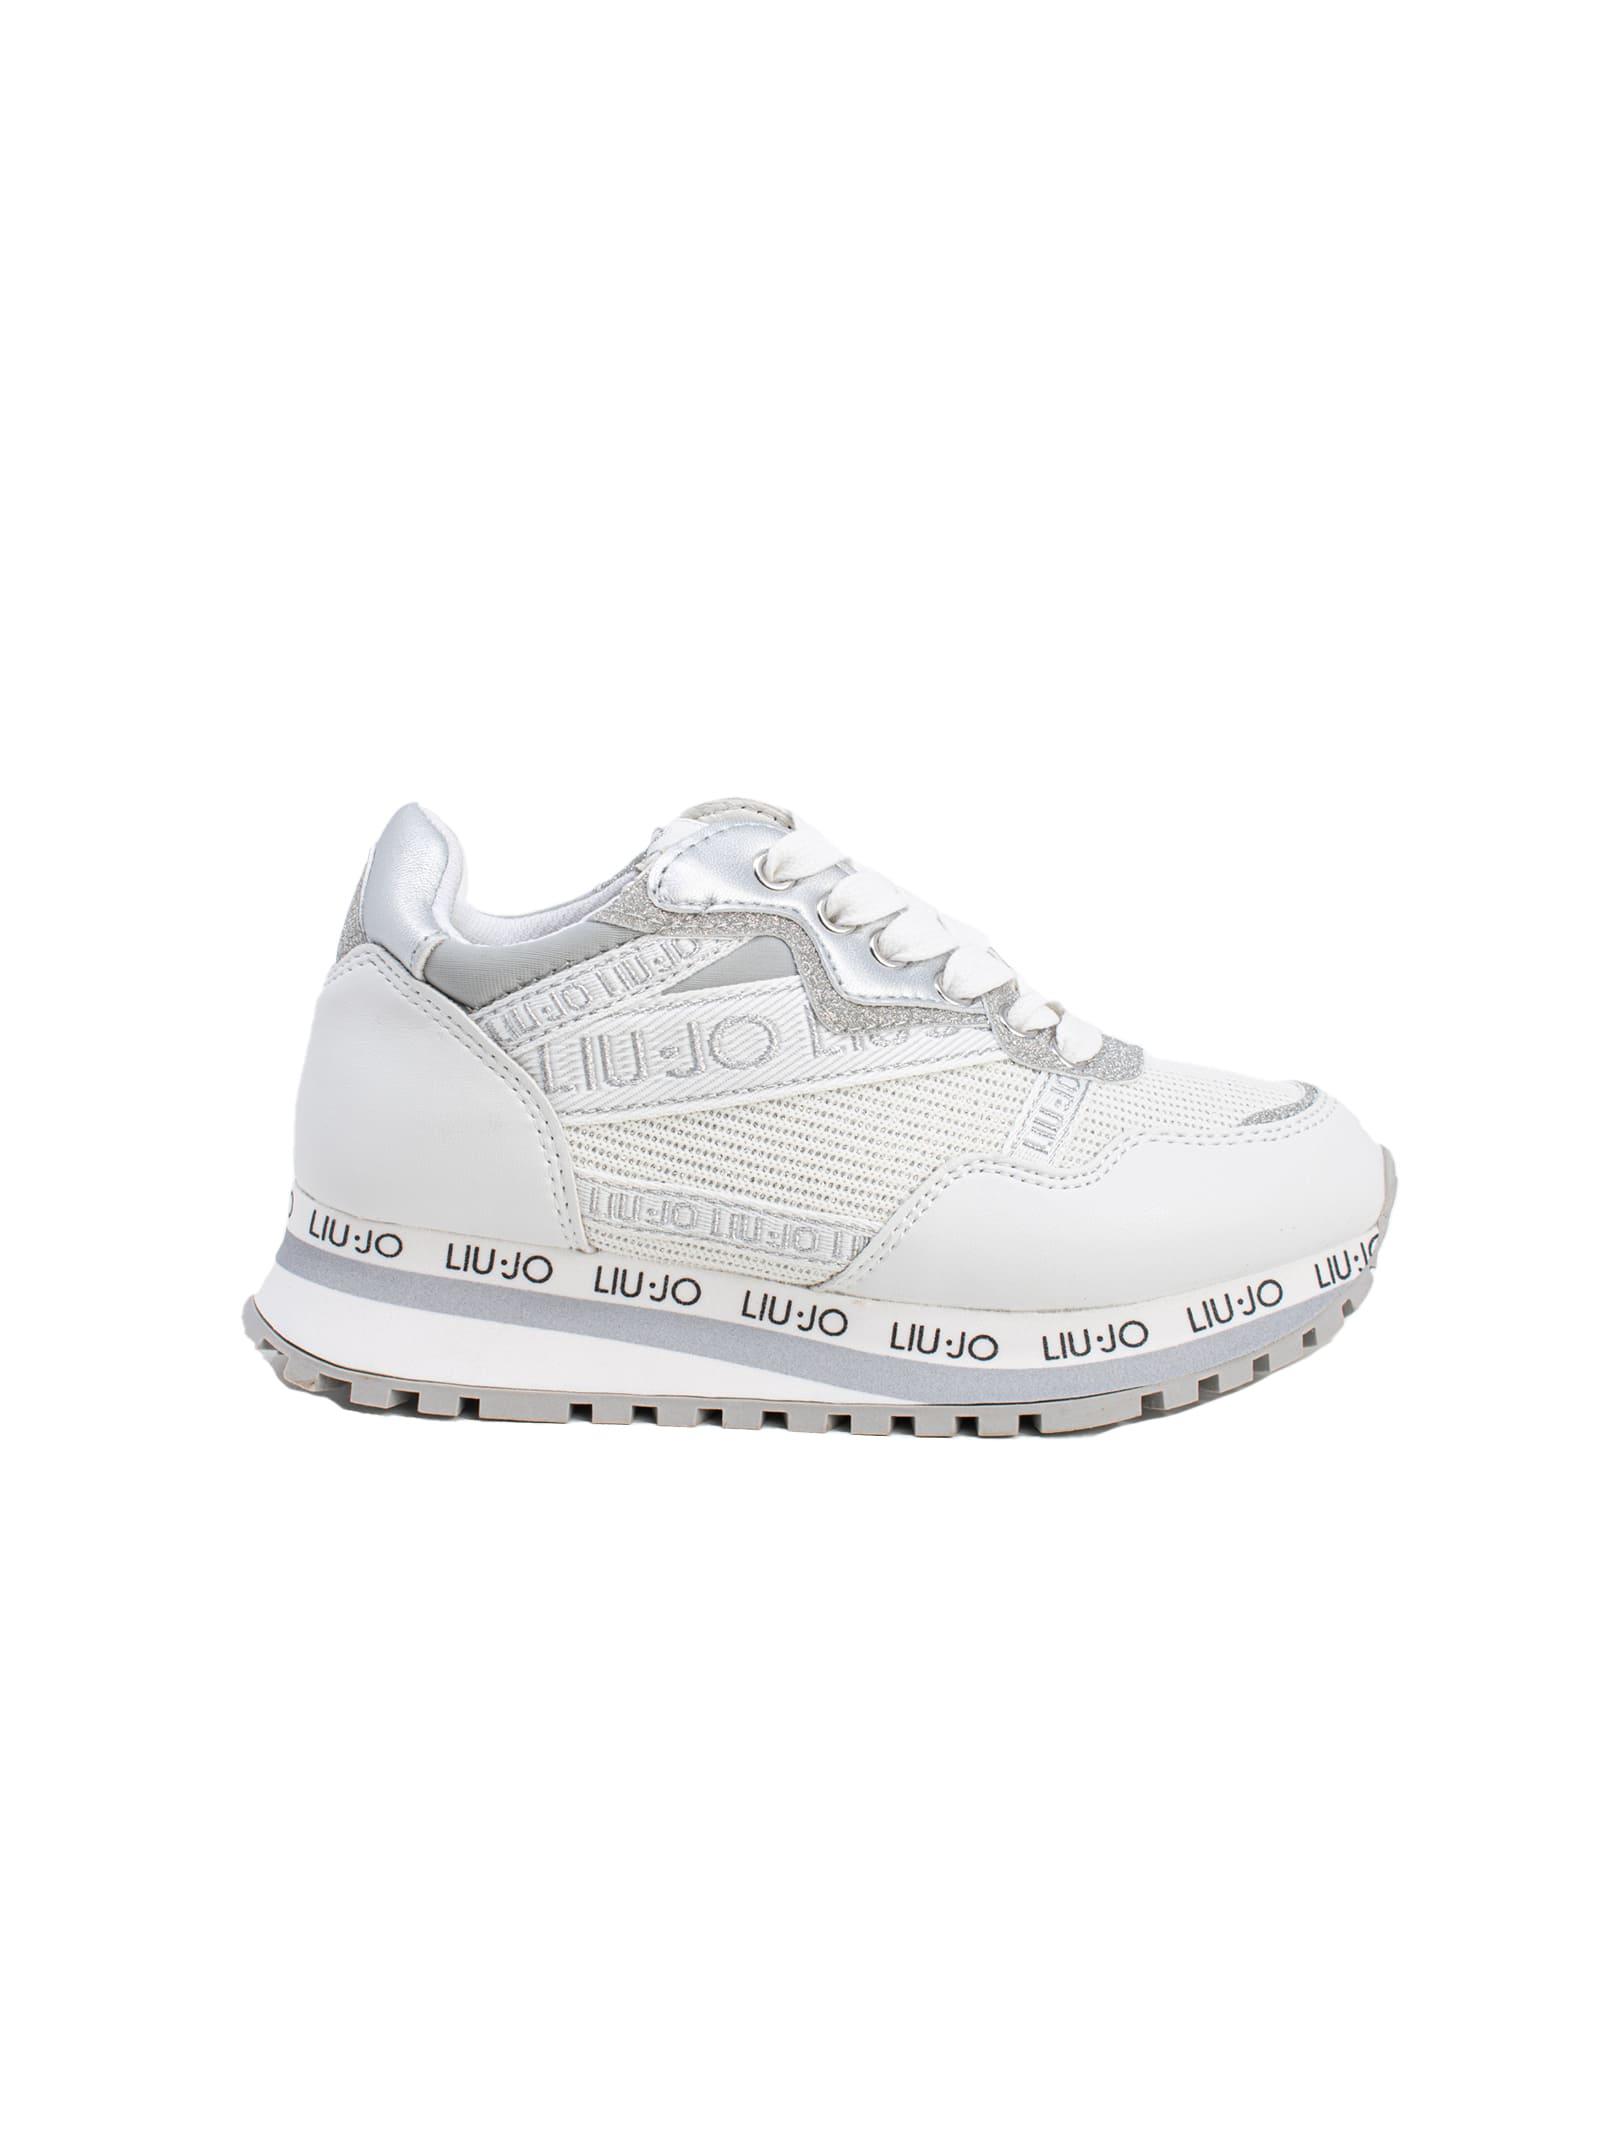 Sneaker Bambina Wonder 17 LIU-JO JUNIOR | Sneakers | 4A1741EX08301111WHITE